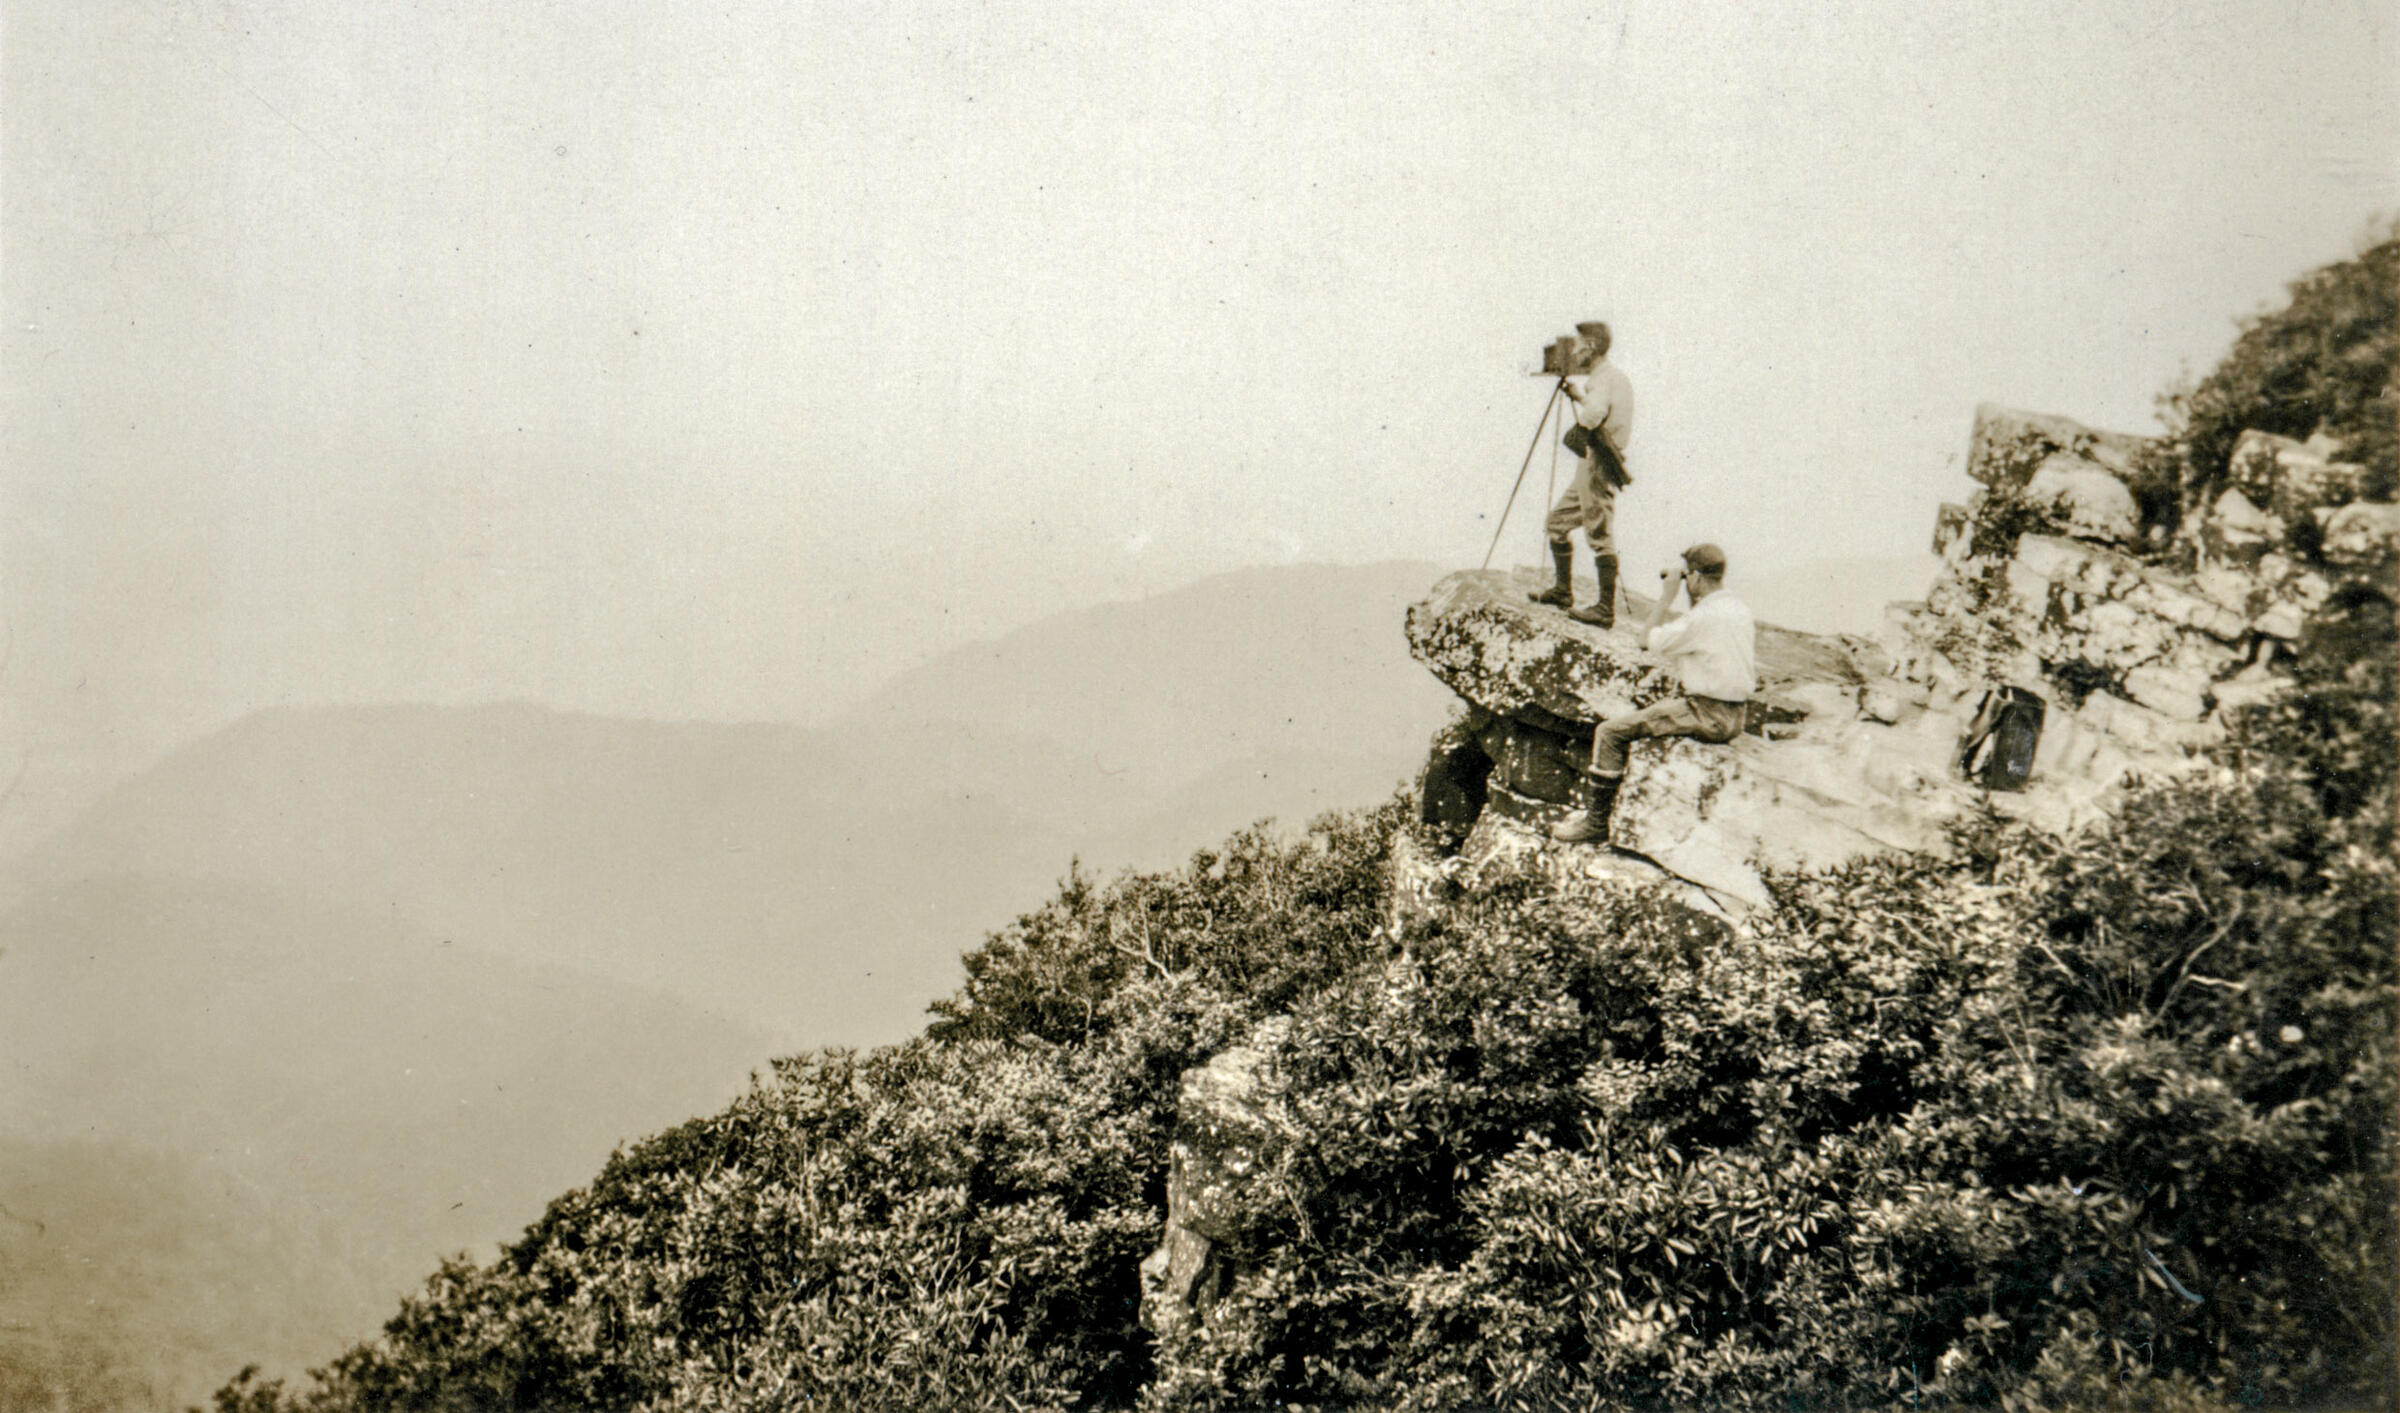 George Masa using a view camera on Graybeard Mountain, North Carolina, 1920s-30s. North Carolina Collection, Pack Memorial Public Library